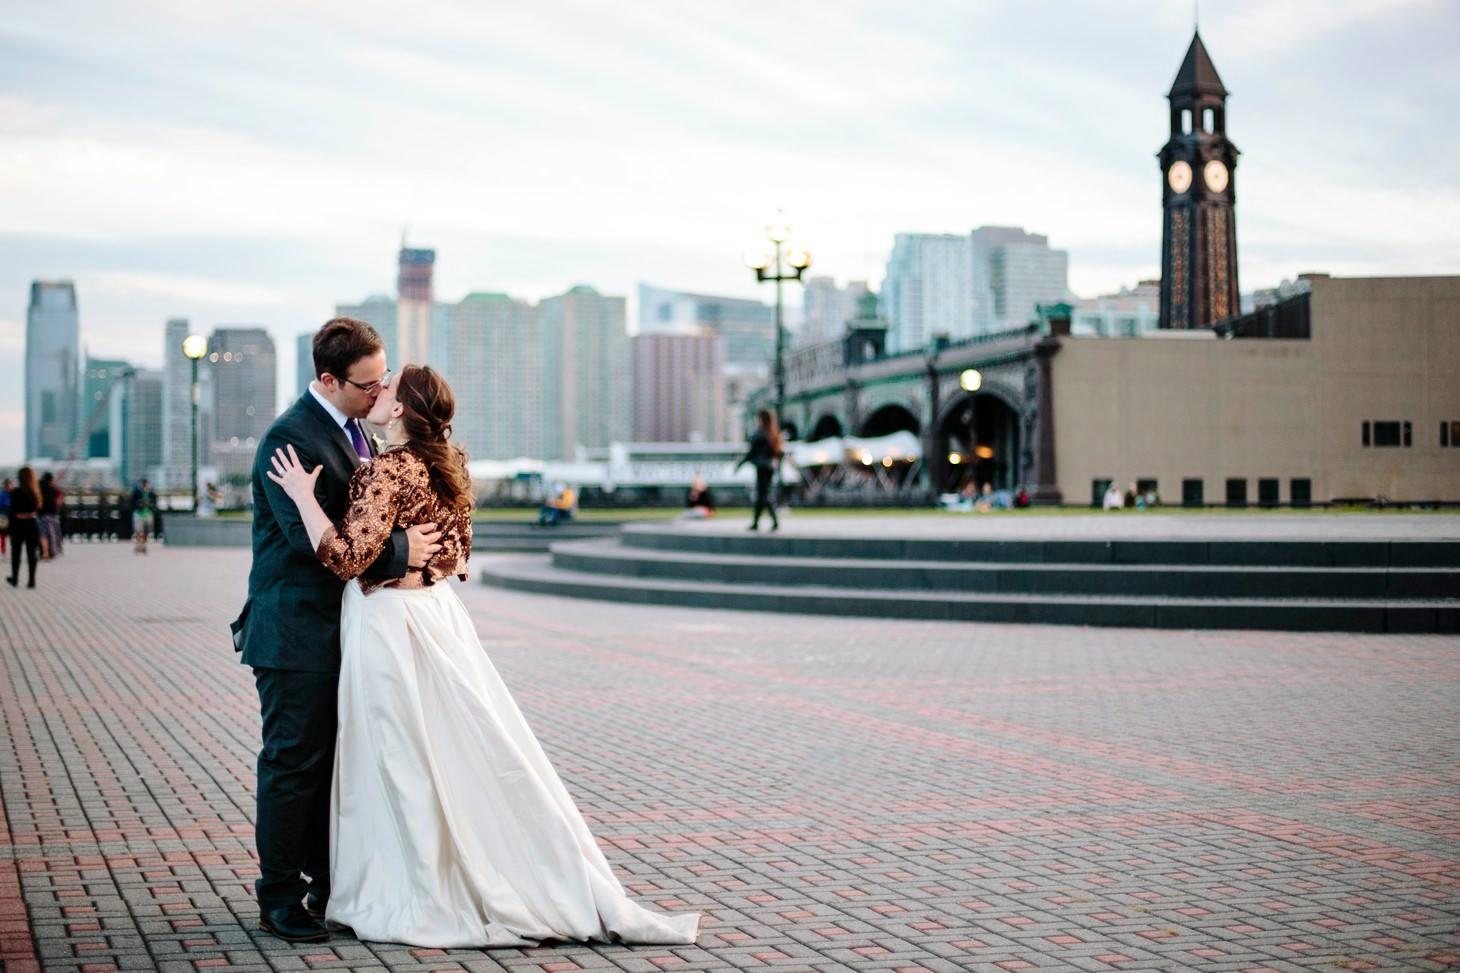 036-nyc-wedding-photographer-smitten-chickens-elope-nyc-wedding-photographer-museum-wedding-smitten-chickens-hoboken.jpg